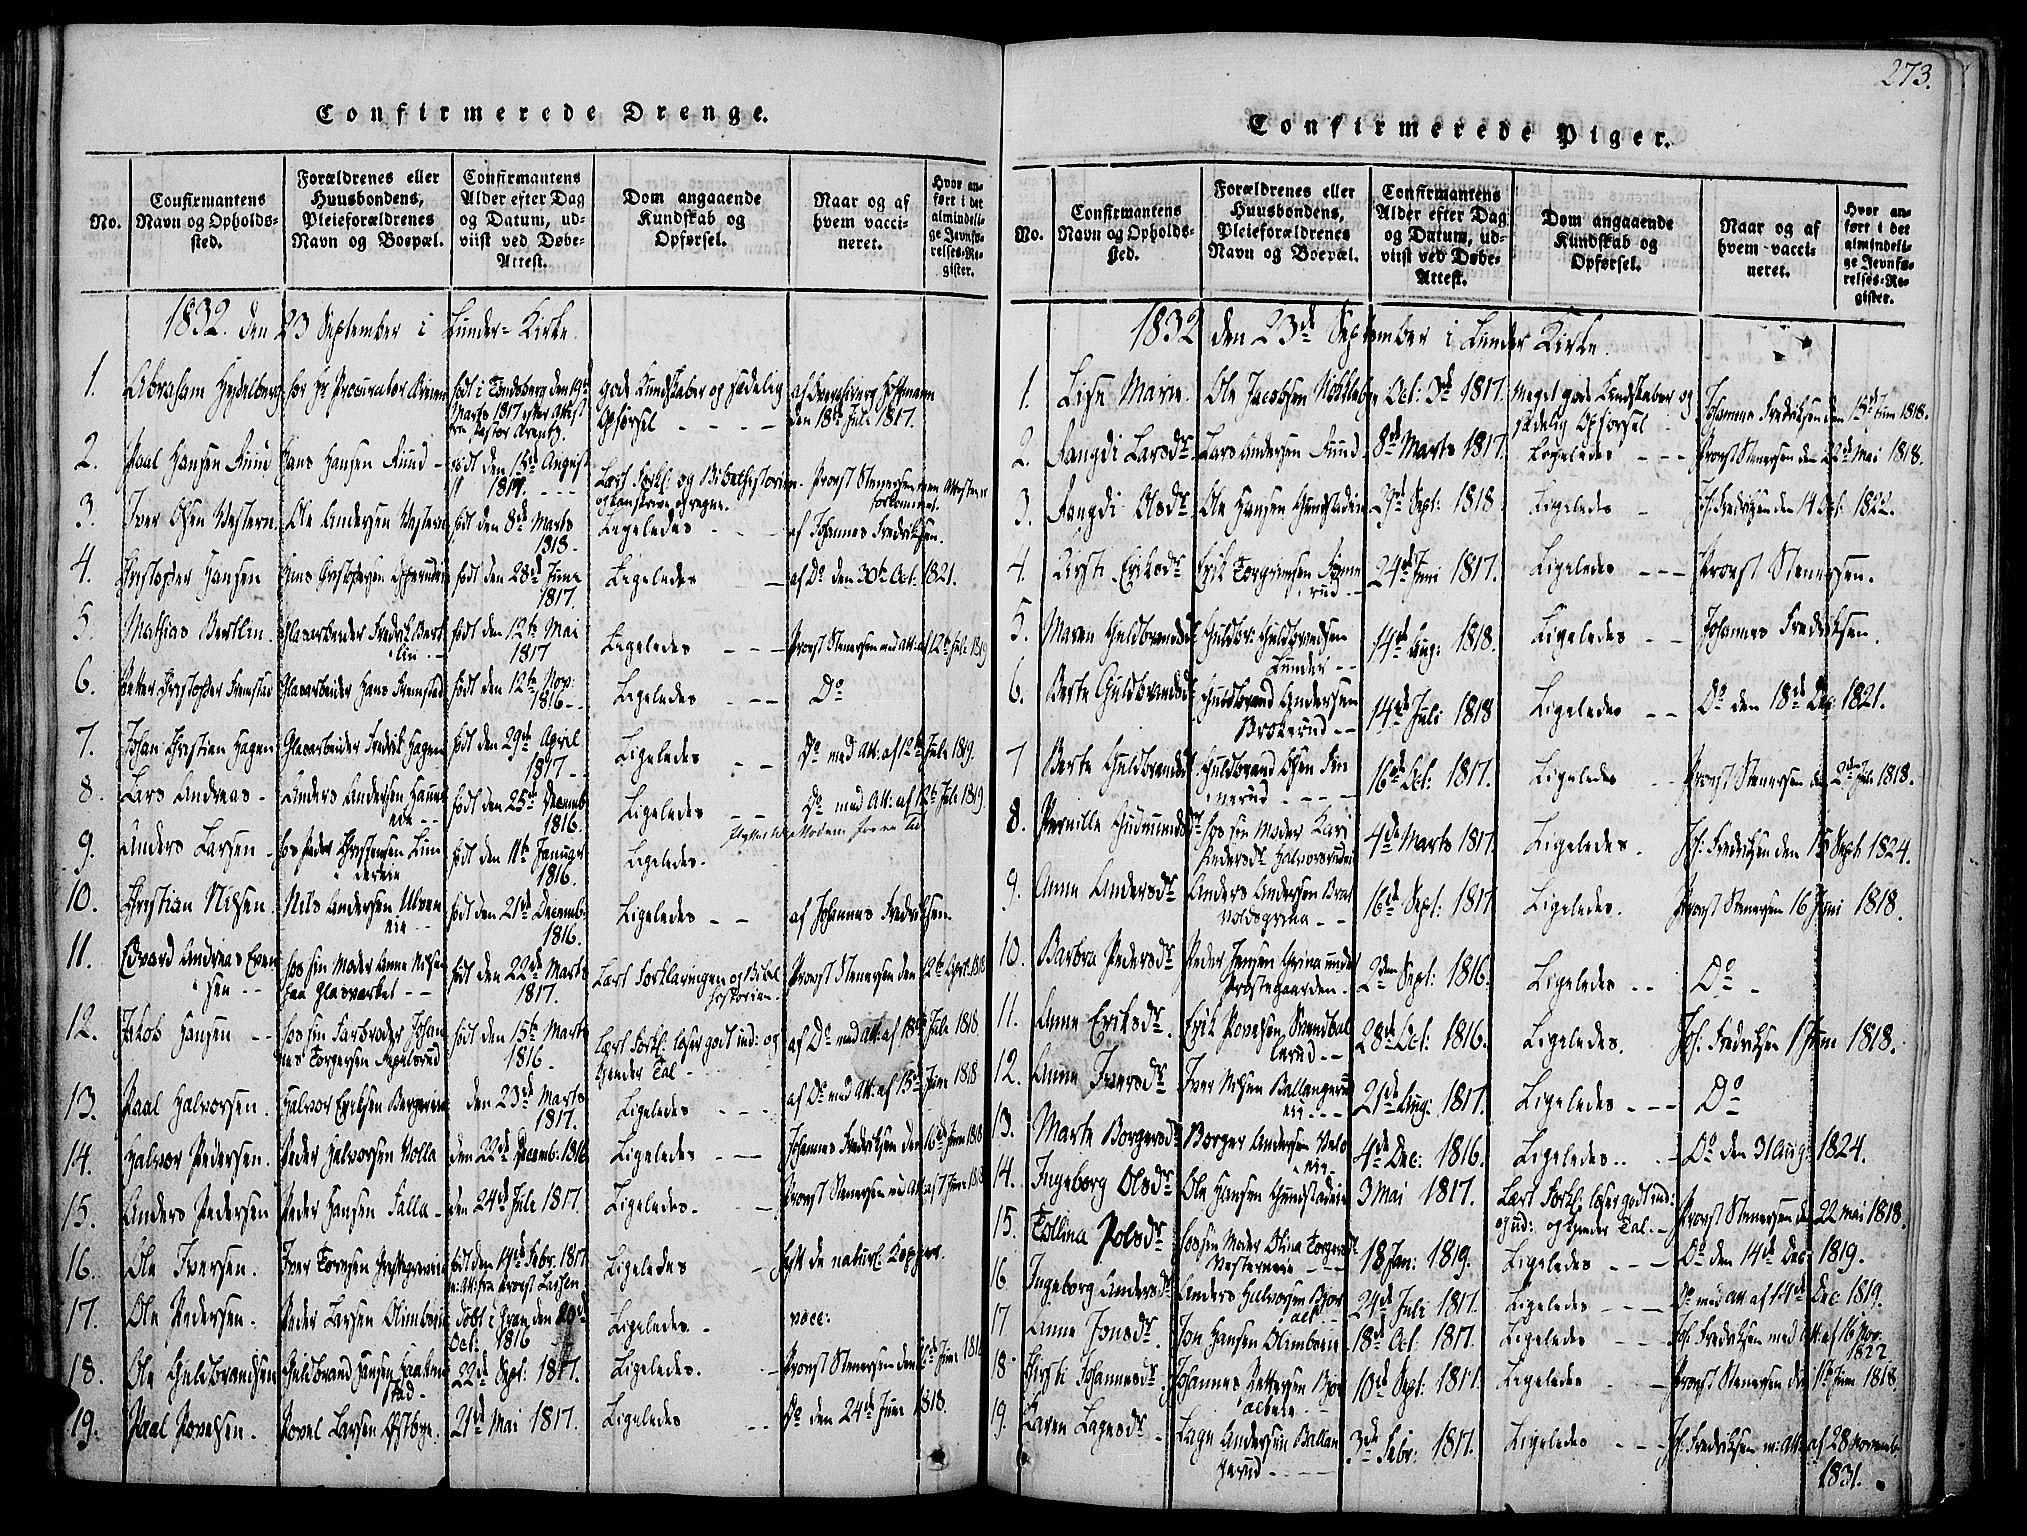 SAH, Jevnaker prestekontor, Ministerialbok nr. 5, 1815-1837, s. 273